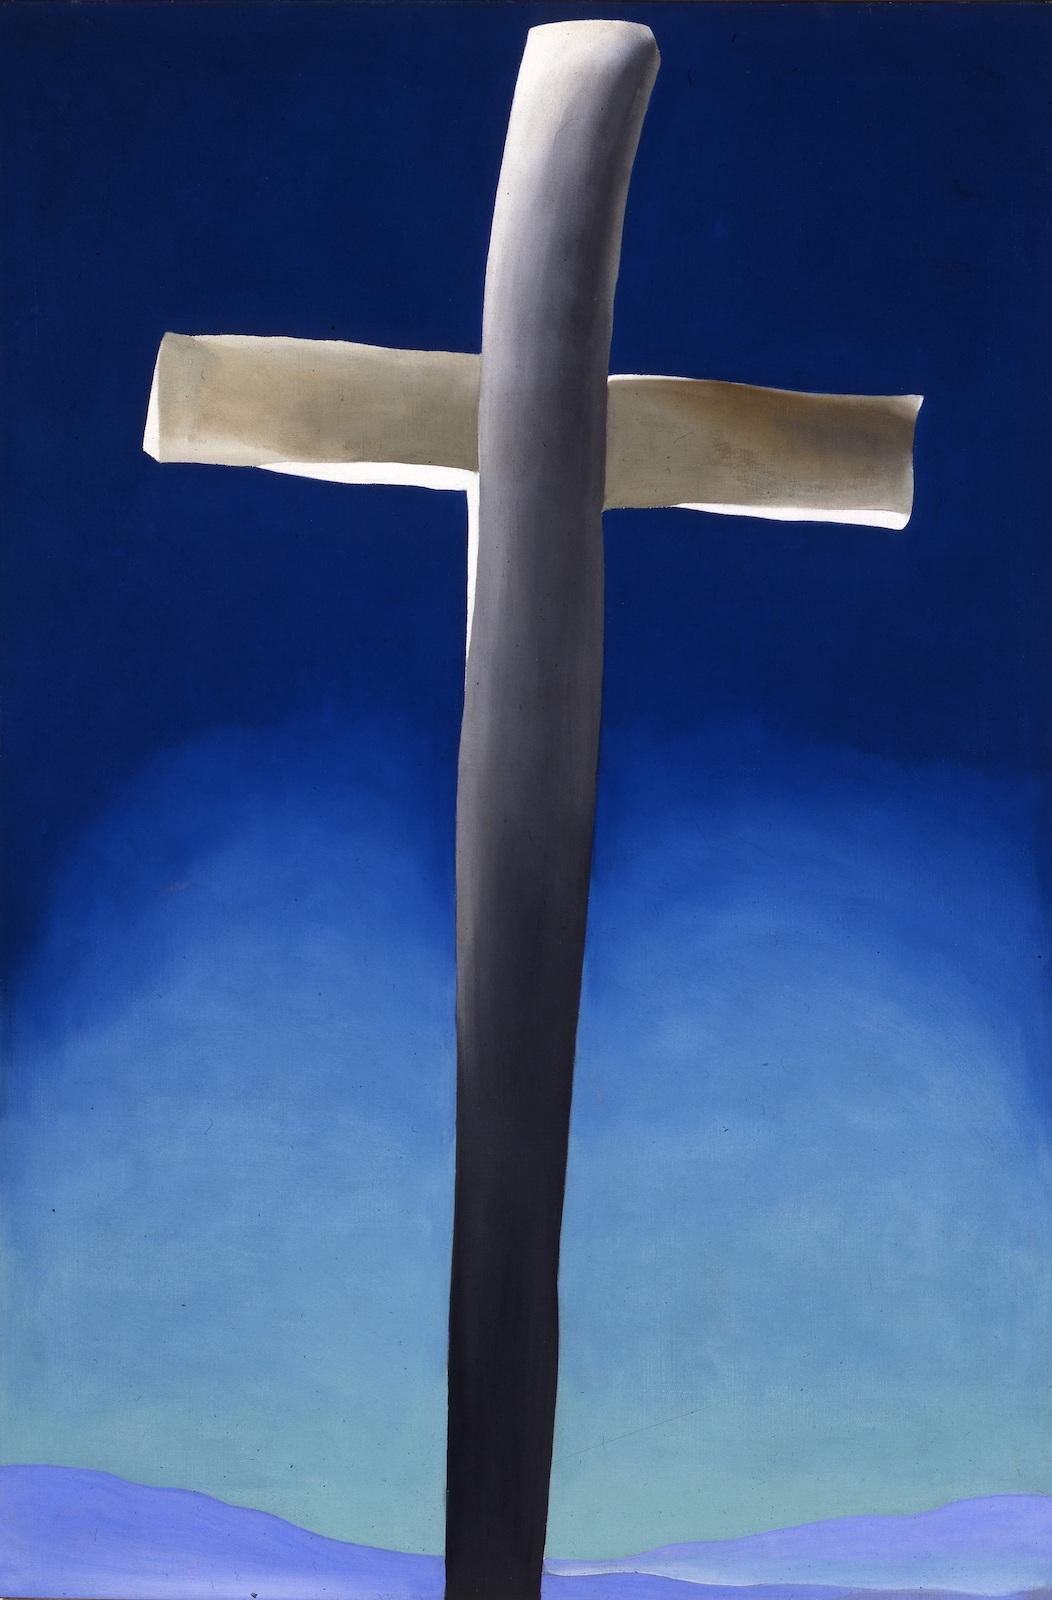 Georgia O'Keeffe, Gray Cross With Blue